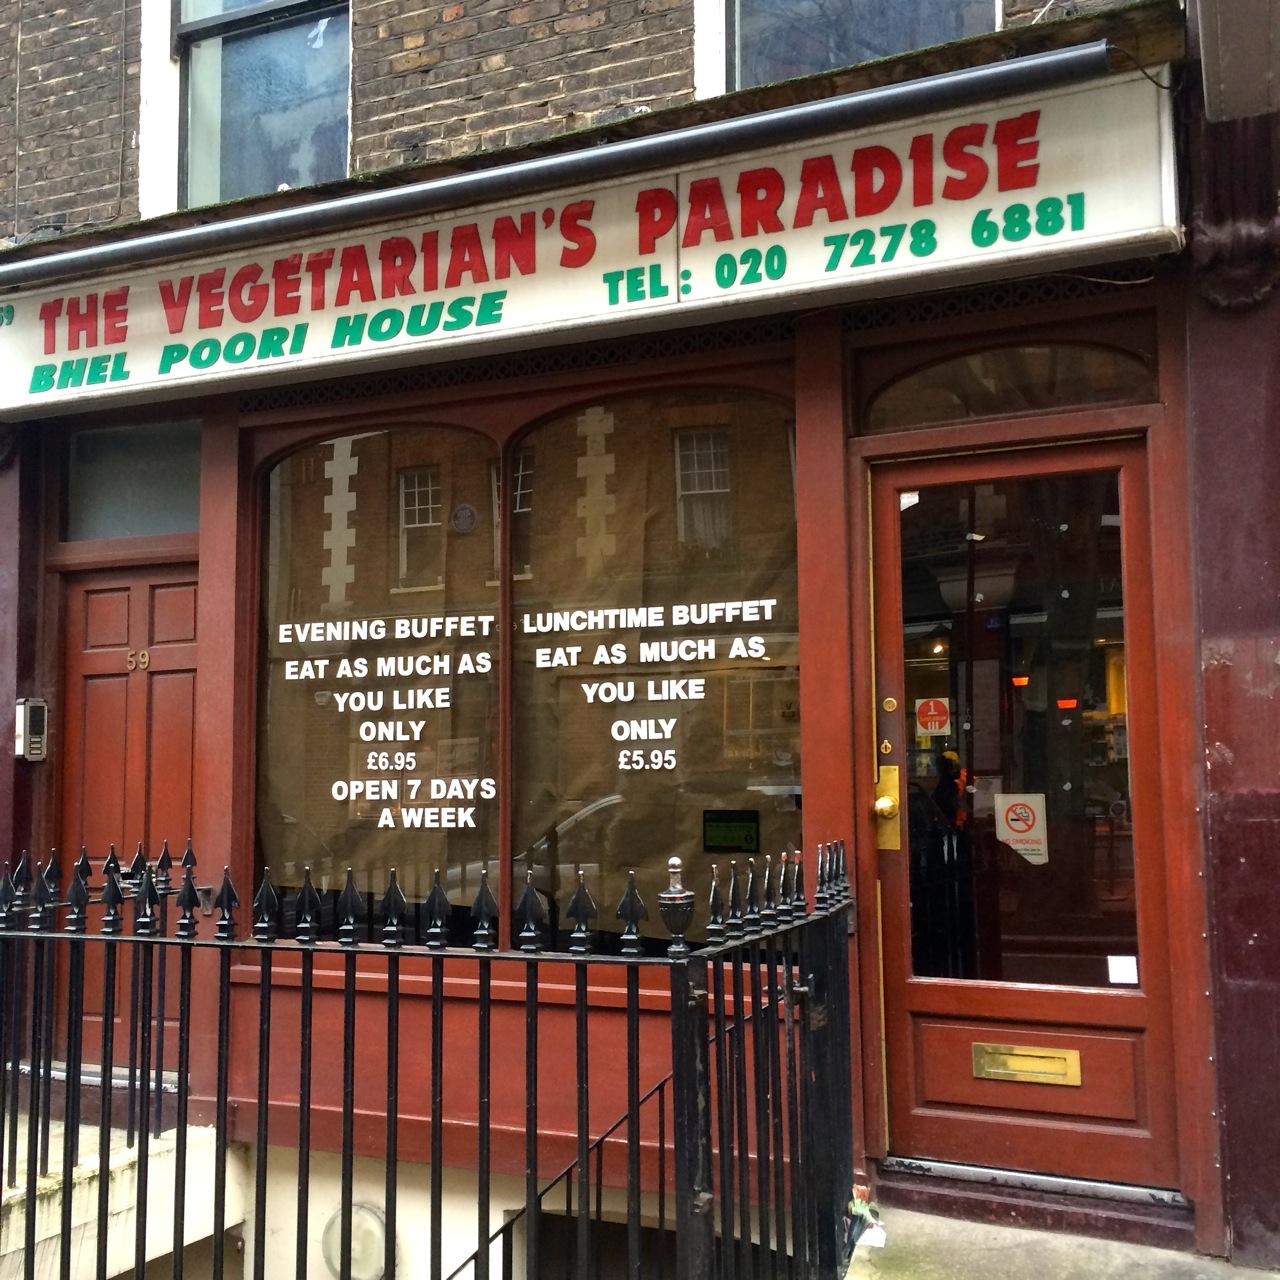 http://fatgayvegan.com/wp-content/uploads/2015/12/Vegetarian-Paradise-closed.jpg